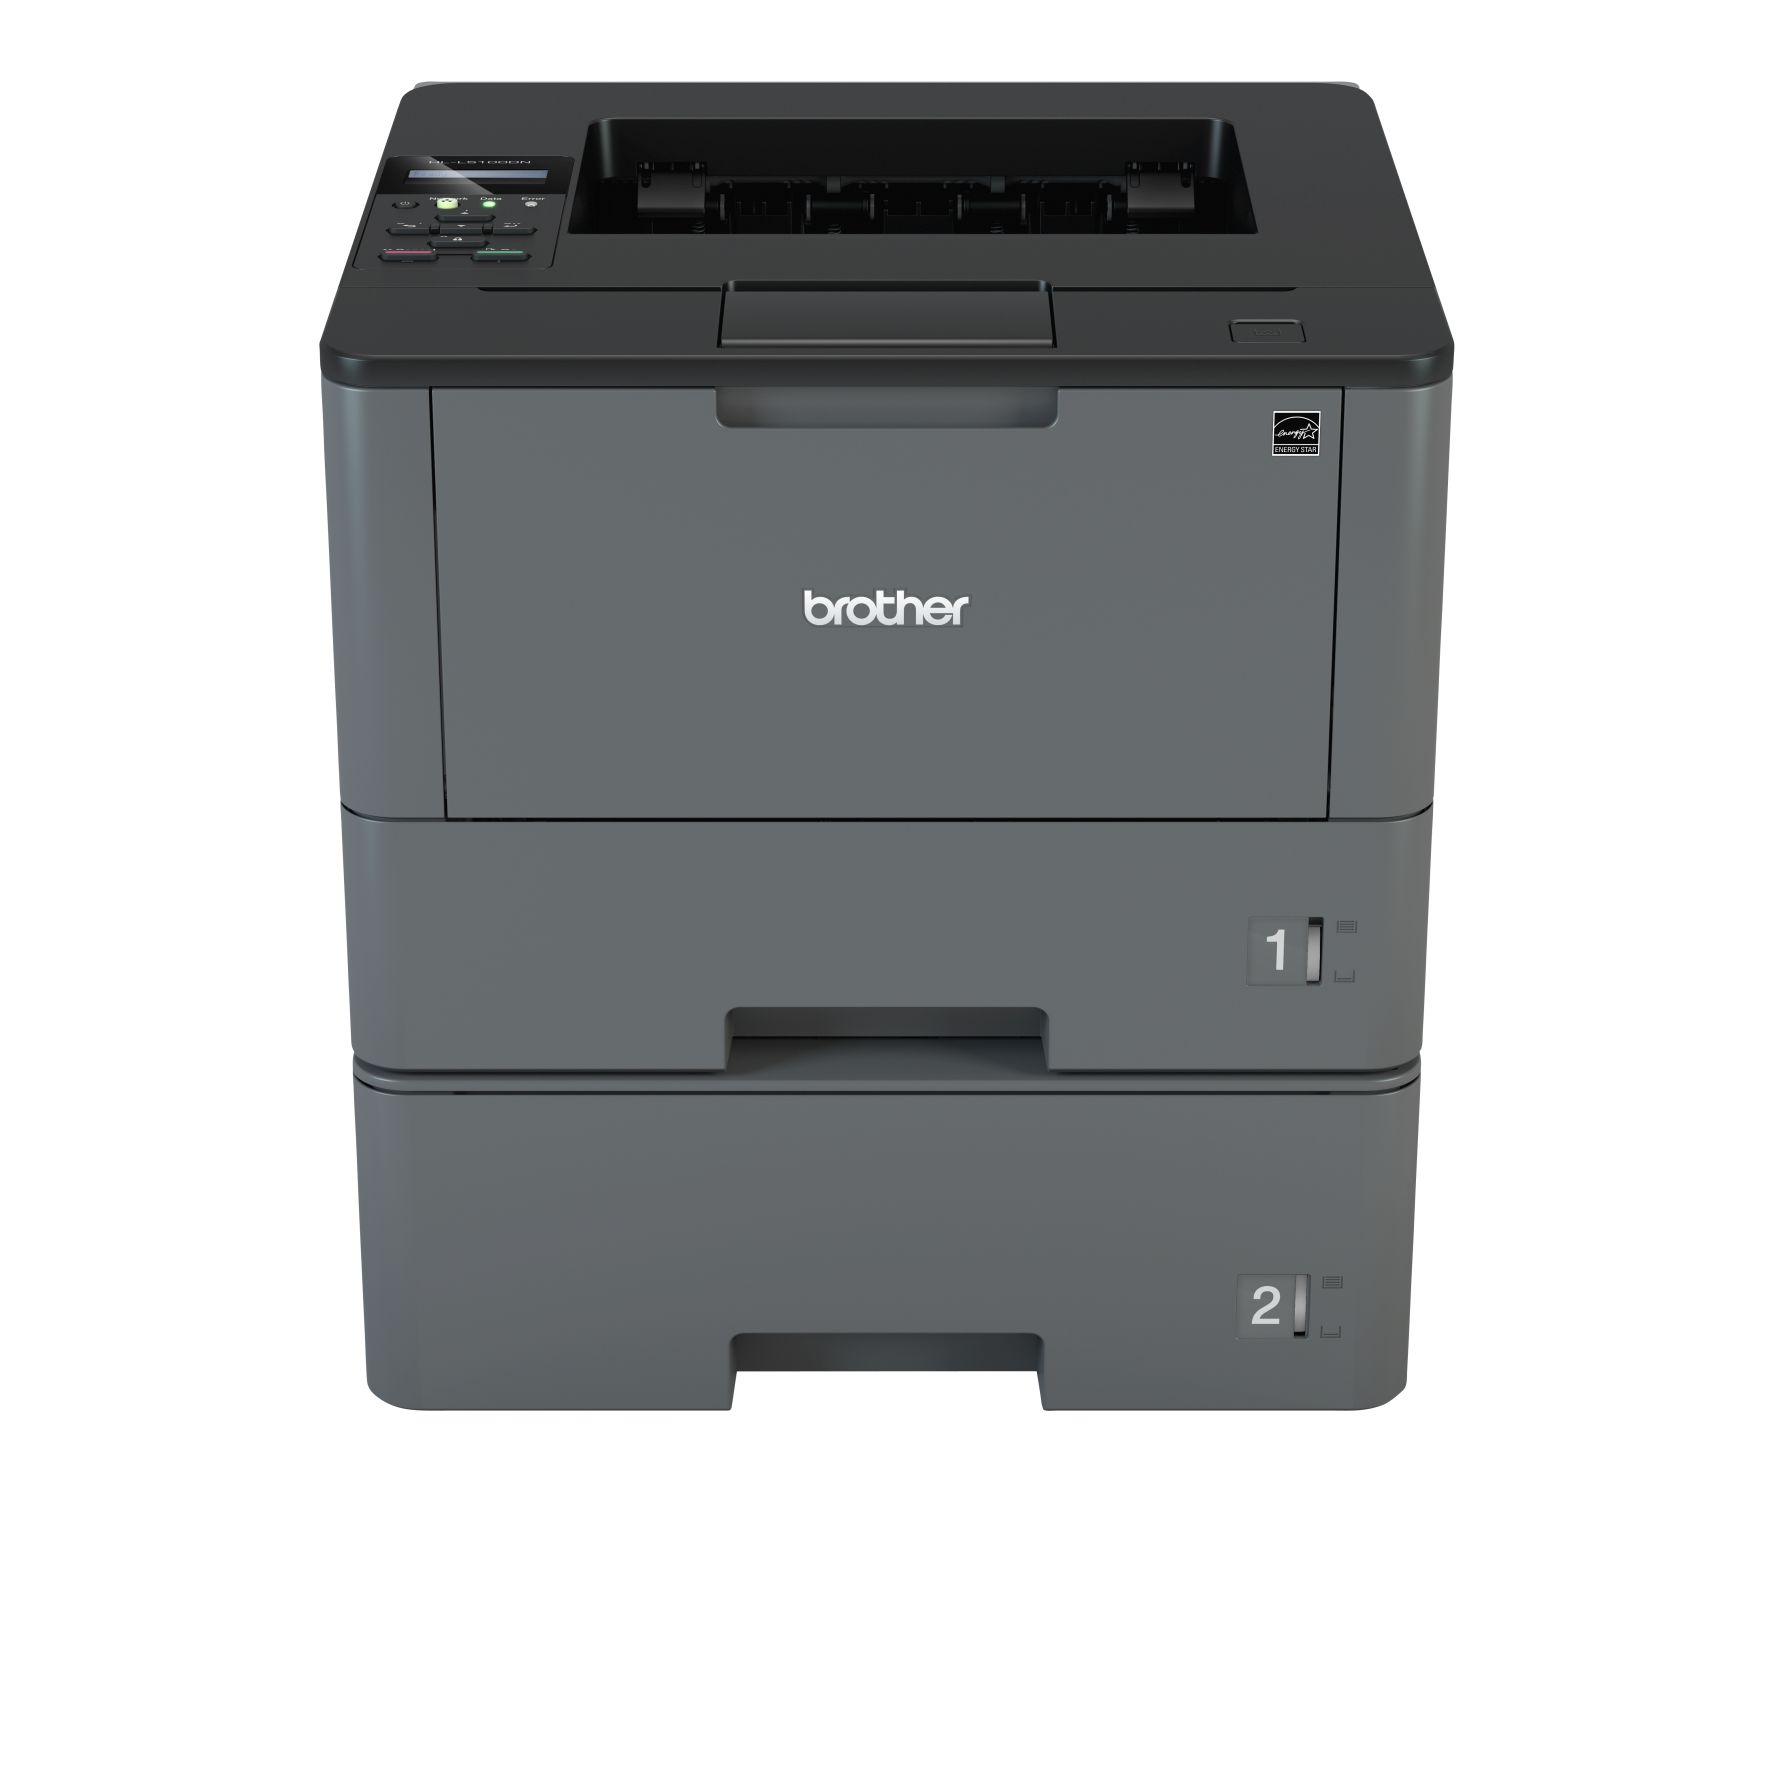 ORIGINAL Brother Drucker  HL-L5100DNT HLL5100DNTG1  Brother HL-L5100DNT S/W-Laserdrucker